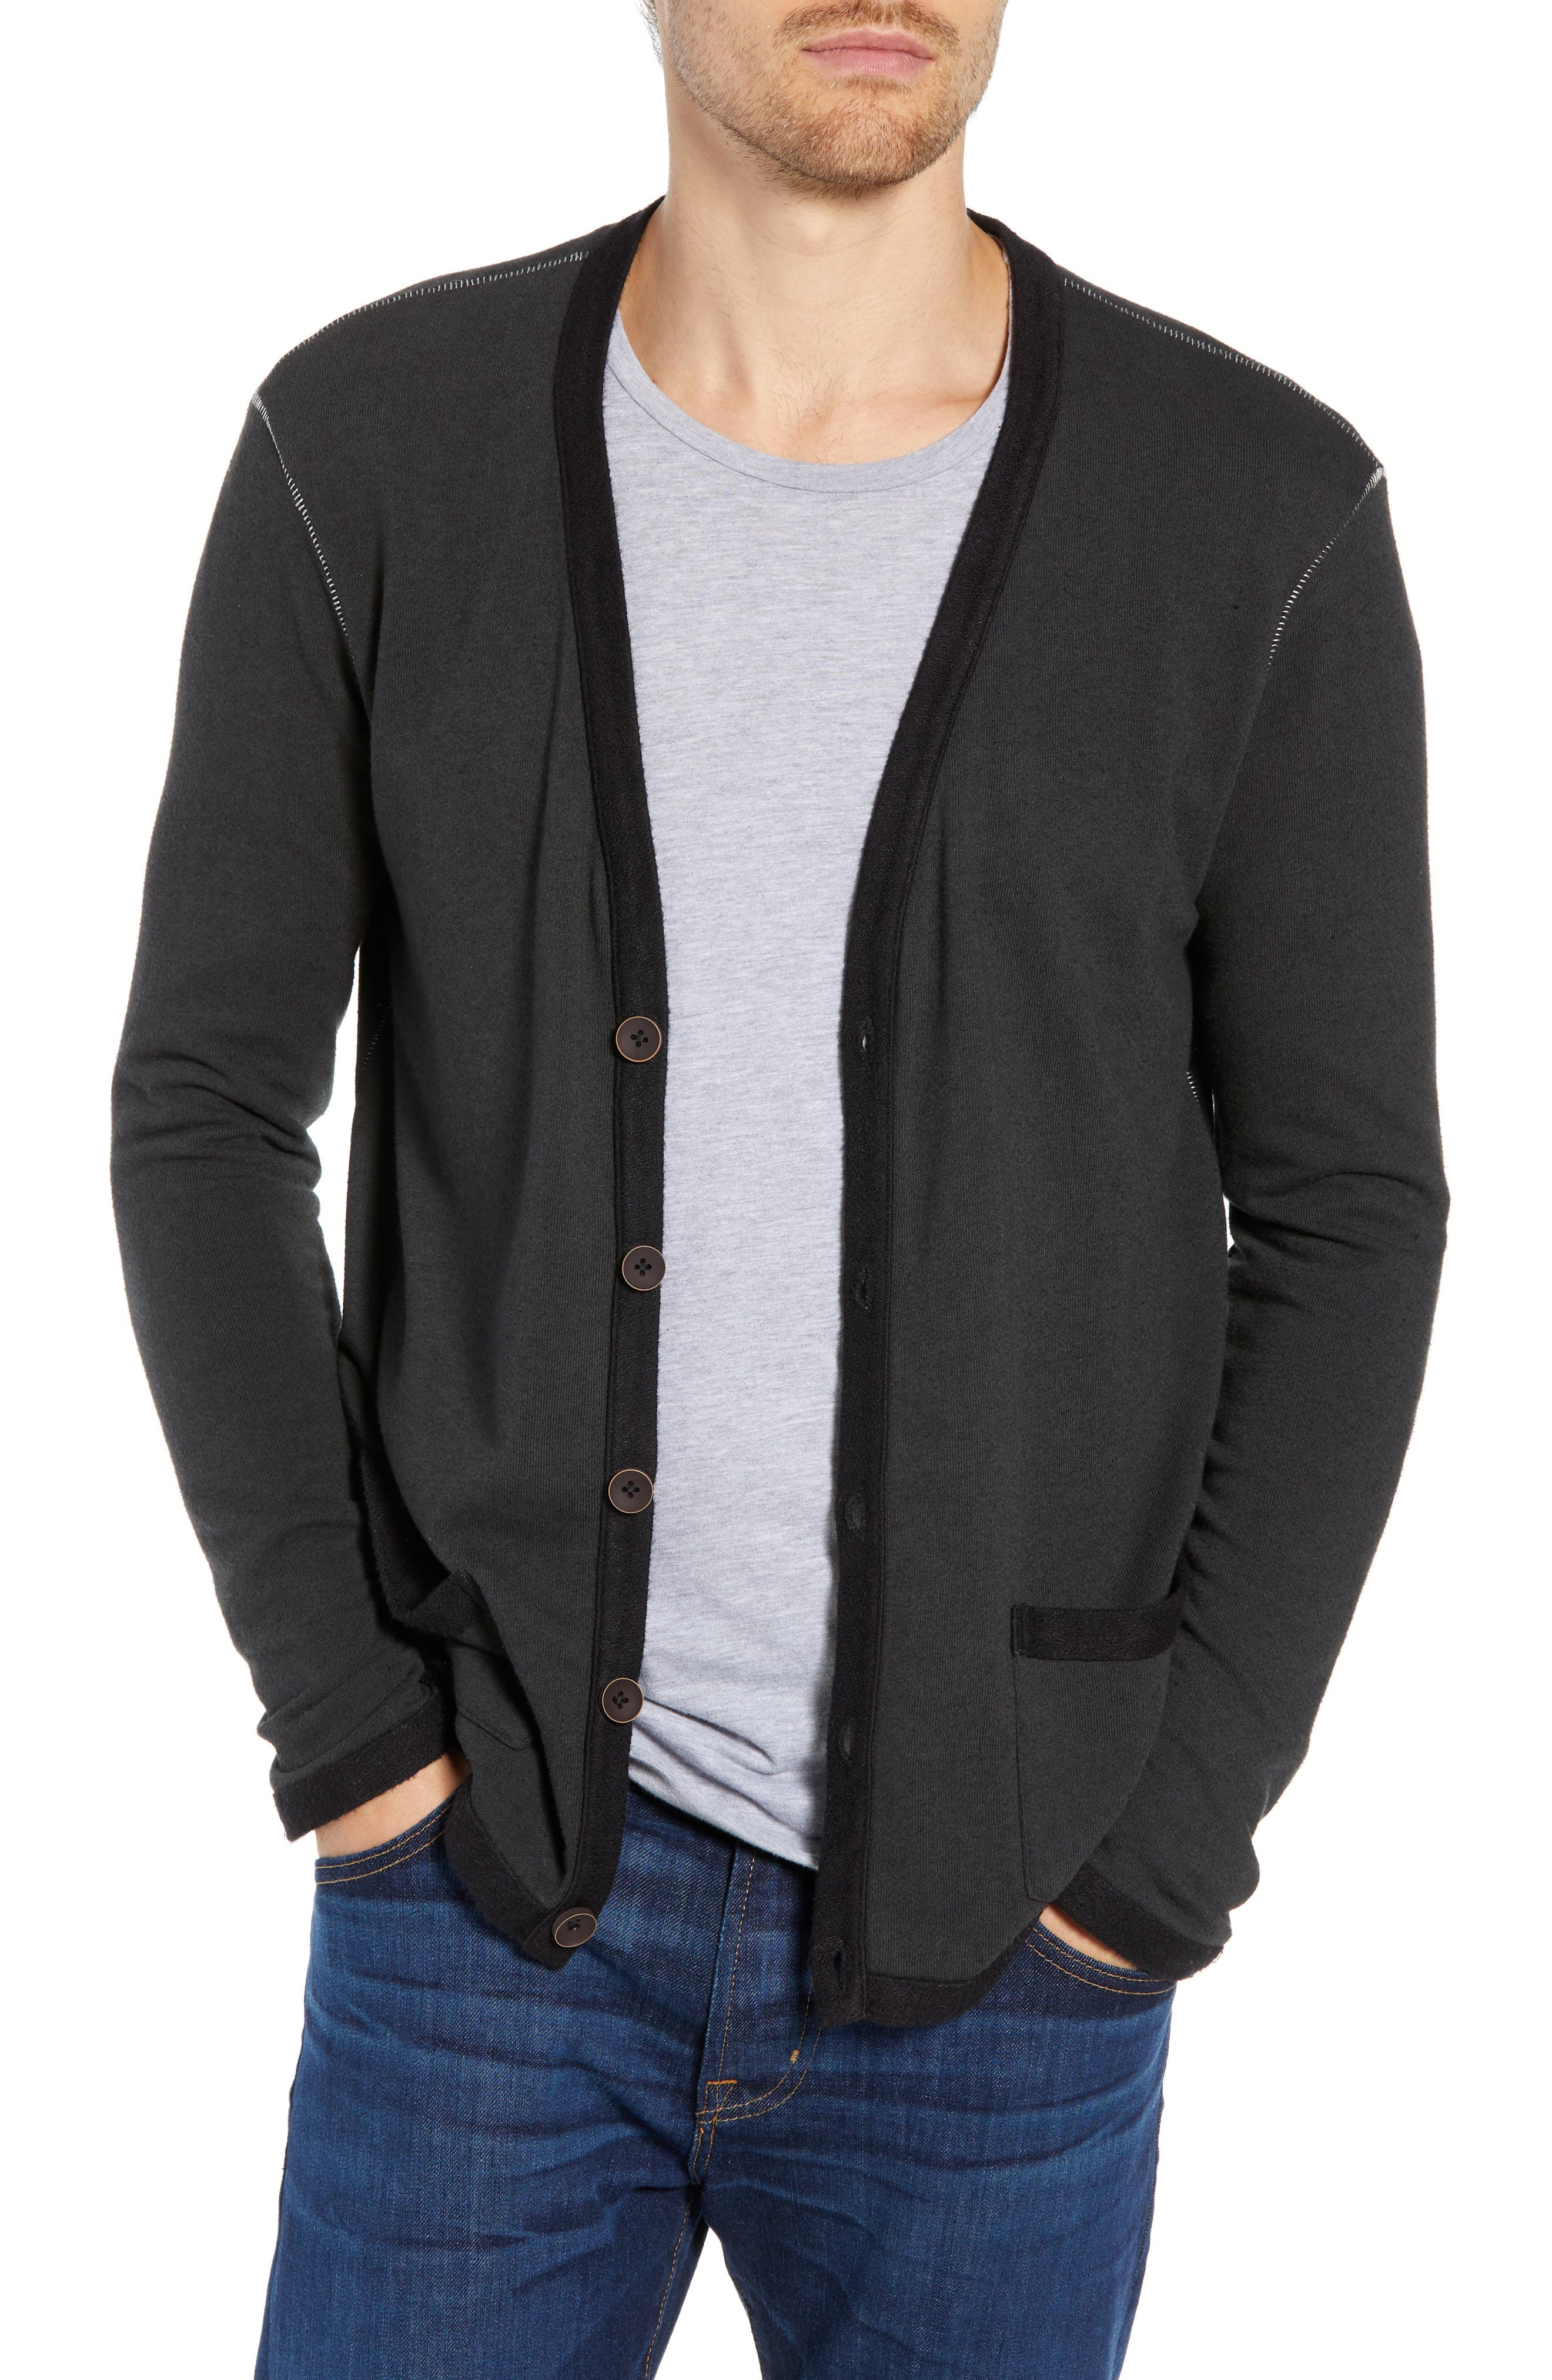 M.singer Cardigan Sweater, Grey